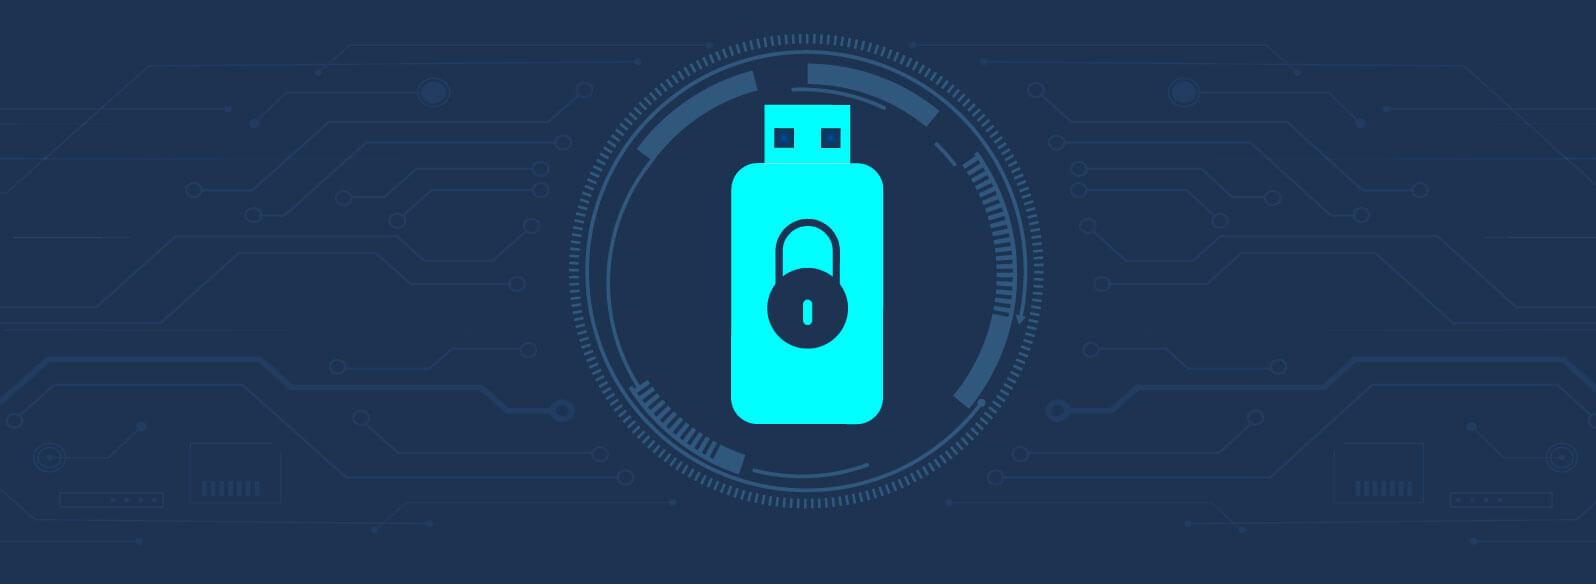 USB device control - ManageEngine Device Control Plus